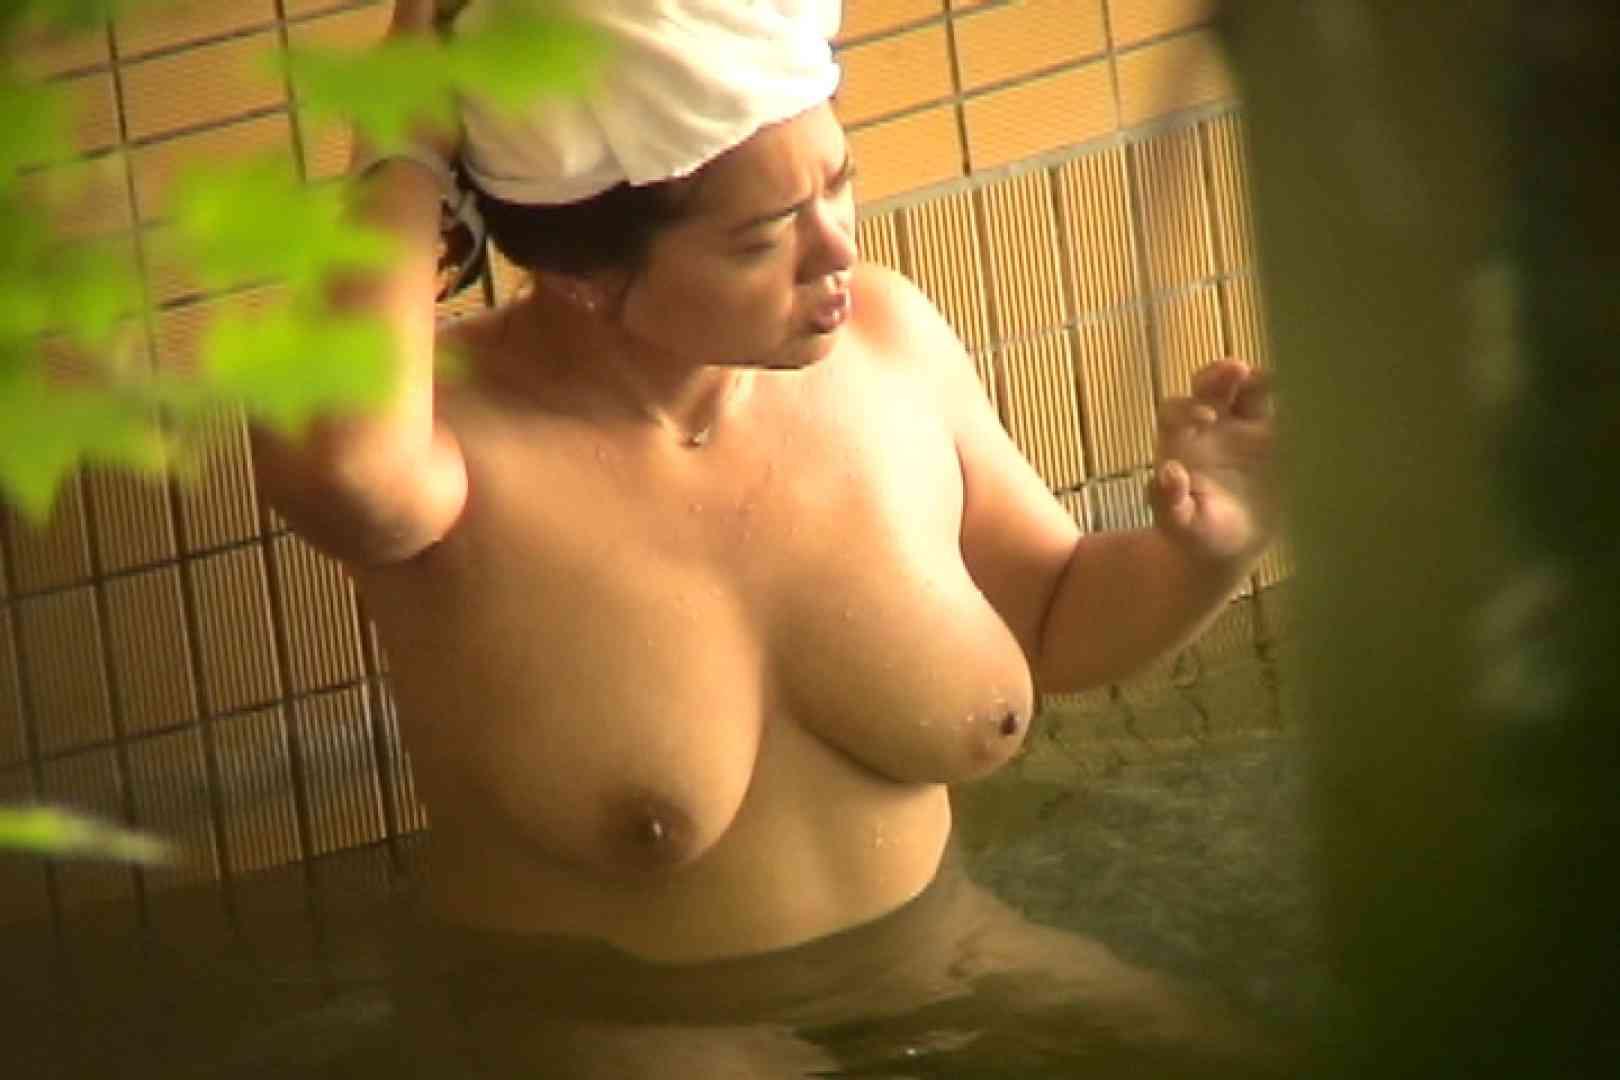 Aquaな露天風呂Vol.449 盗撮 | HなOL  101pic 88